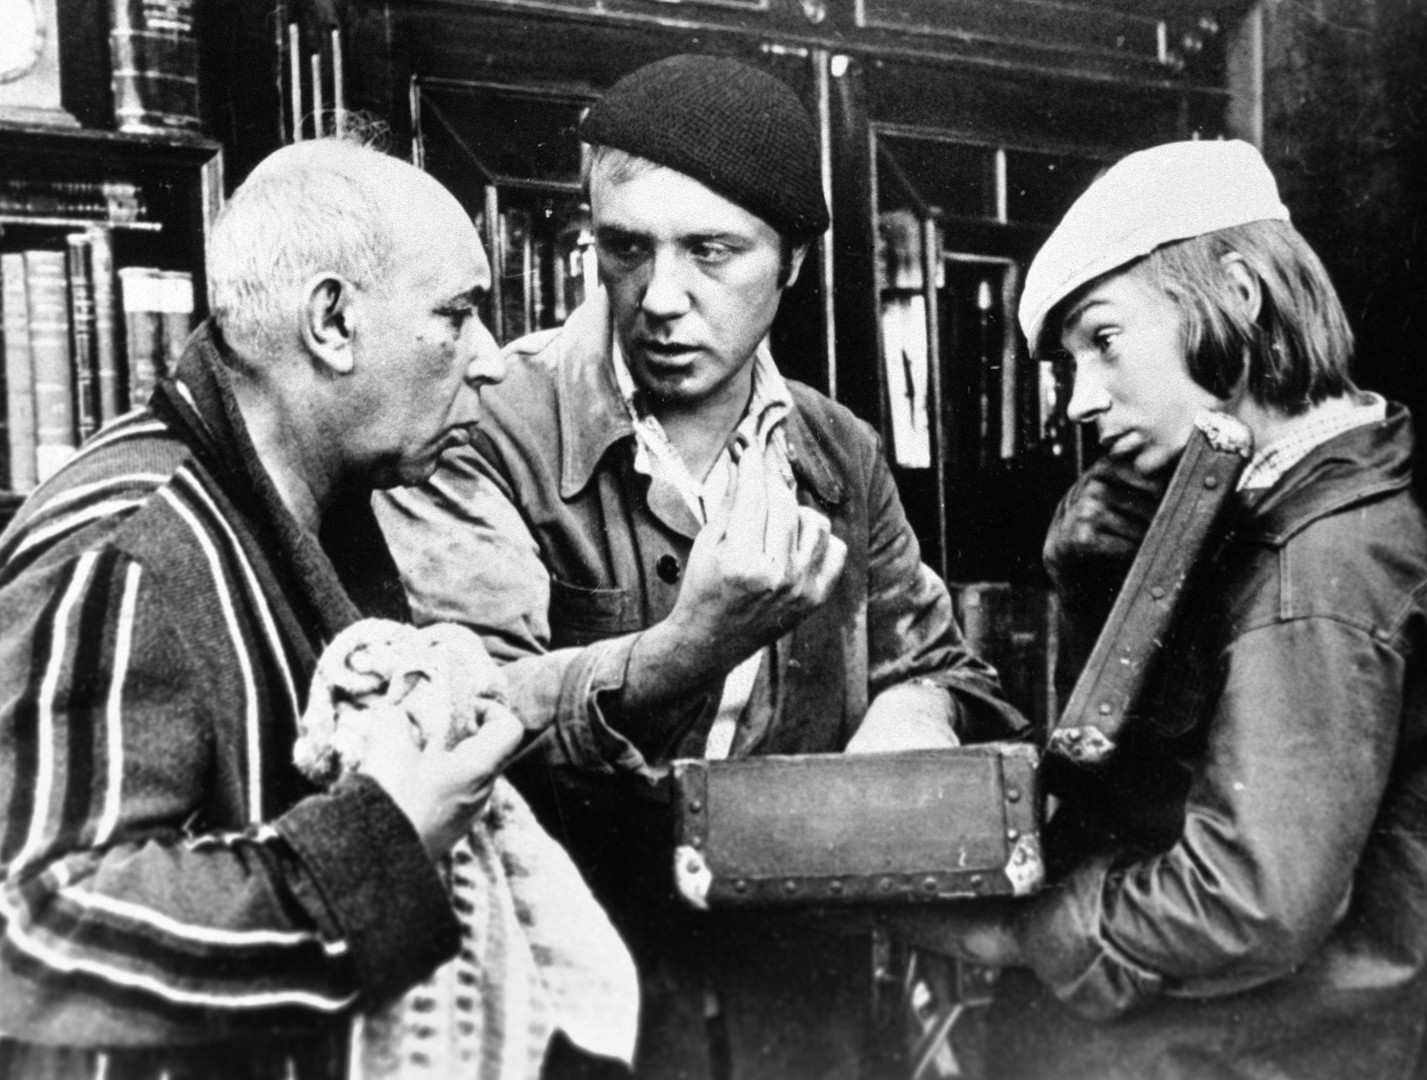 Актёр Готлиб Ронинсон (слева) и Леонид Куравлёв (в центре) в фильме режиссёра Г. Данелия «Афоня».